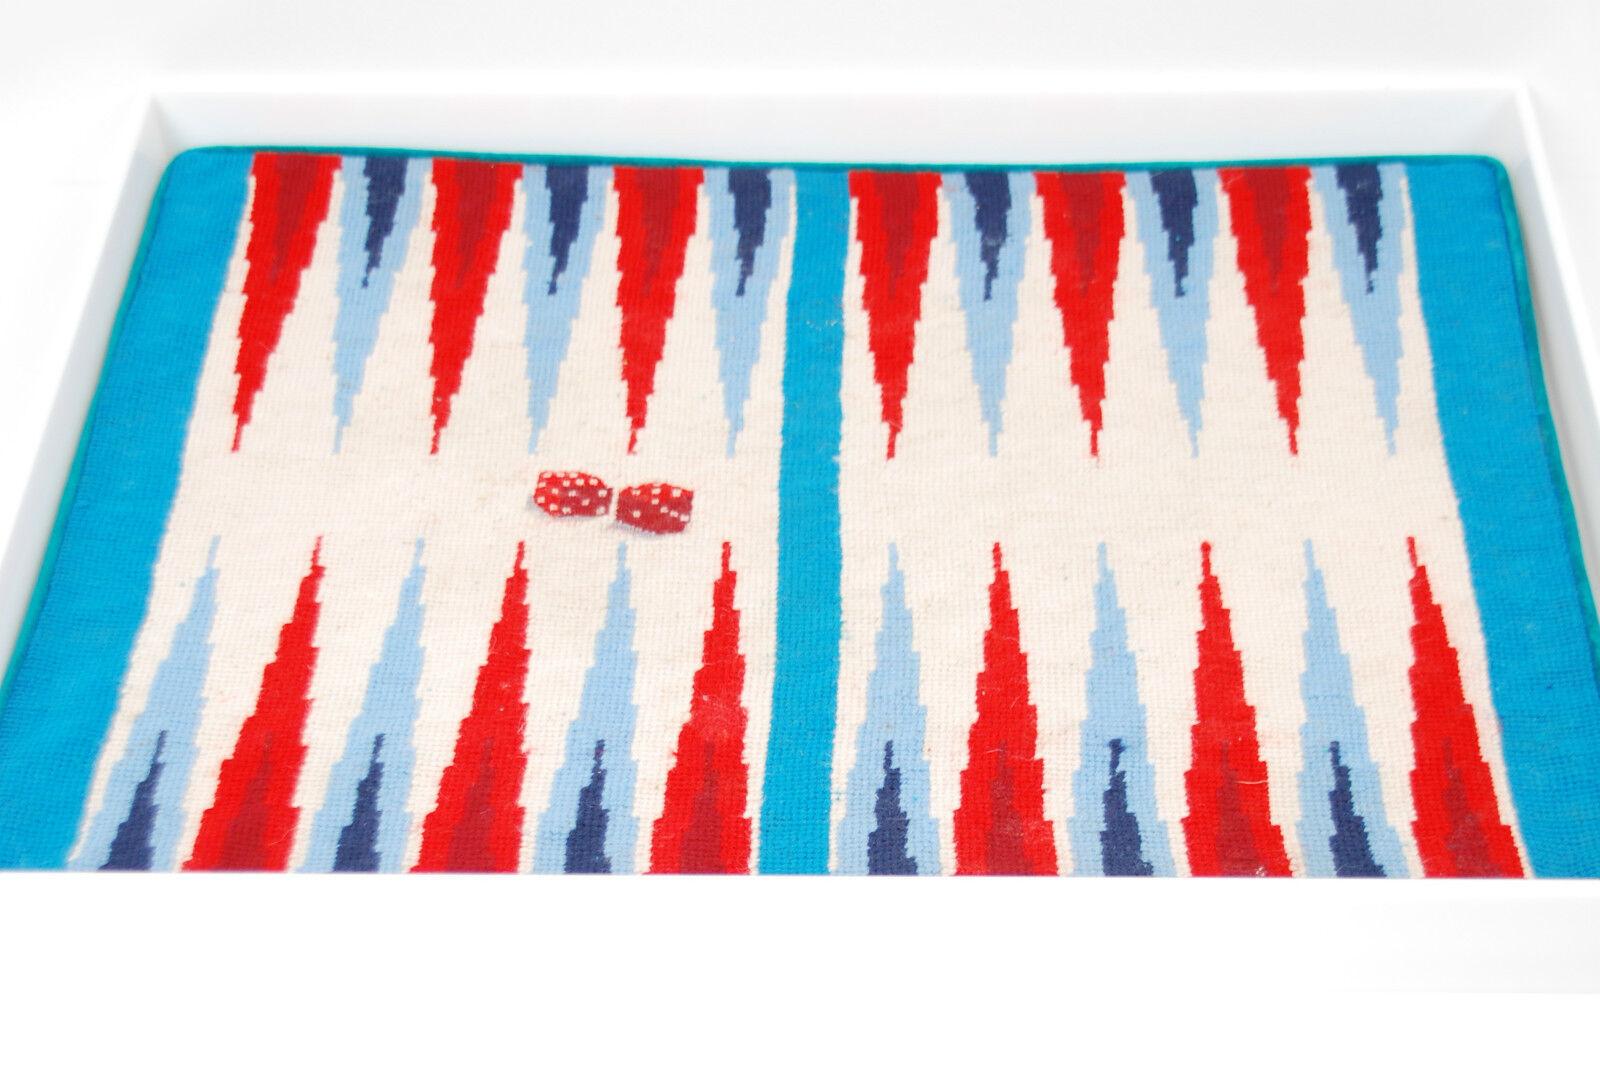 suministro directo de los fabricantes Jonathan Adler Needlepoint backgammon regalo de Navidad PIR    bcf511  Obtén lo ultimo